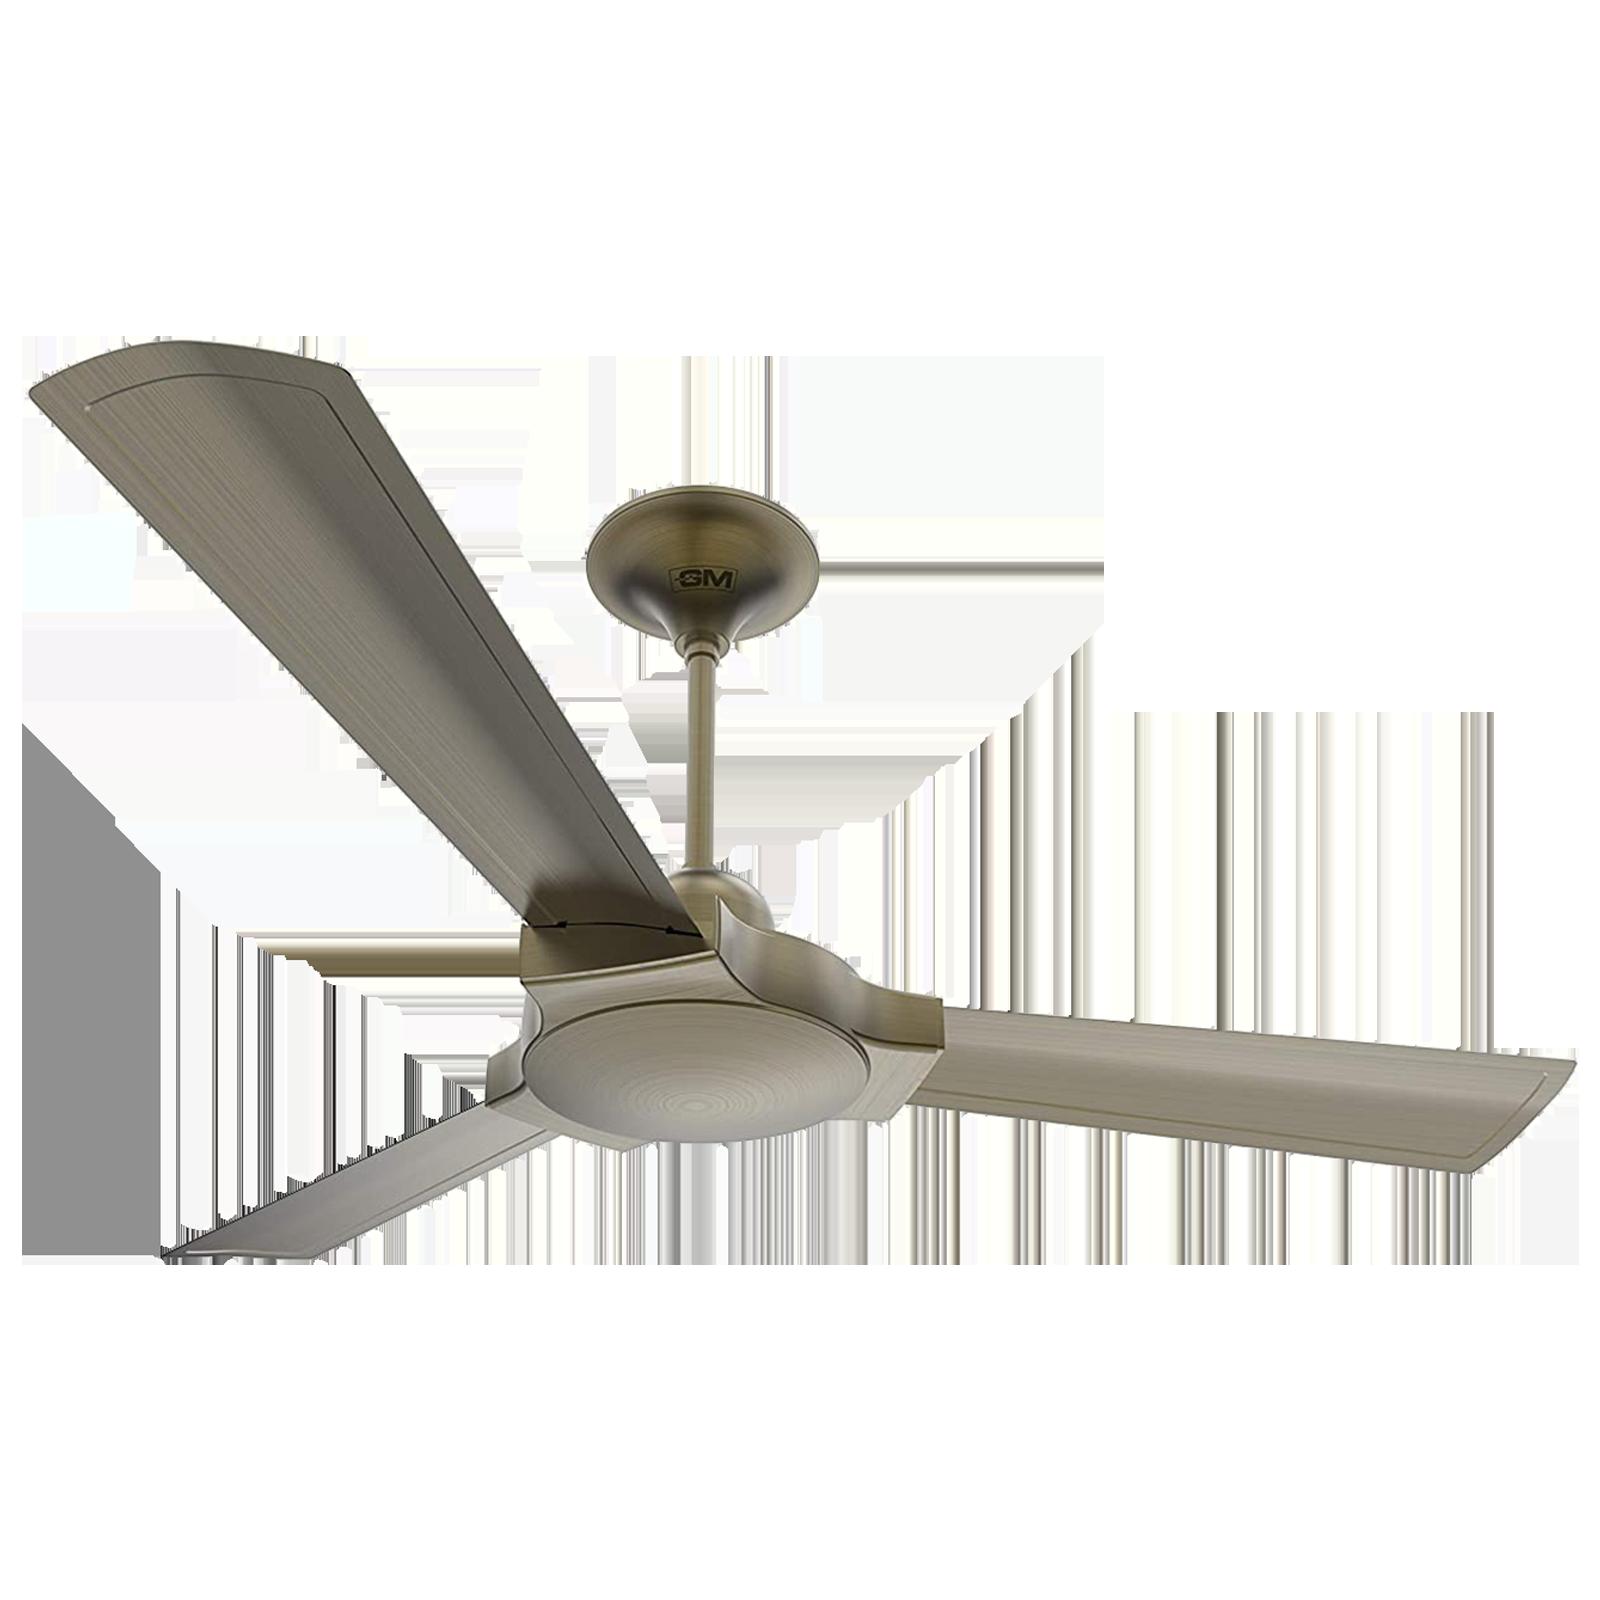 GM Lustre 120 cm Sweep 3 Blade Ceiling Fan (Extra Copper, CFP480013BAEP, Grey)_1